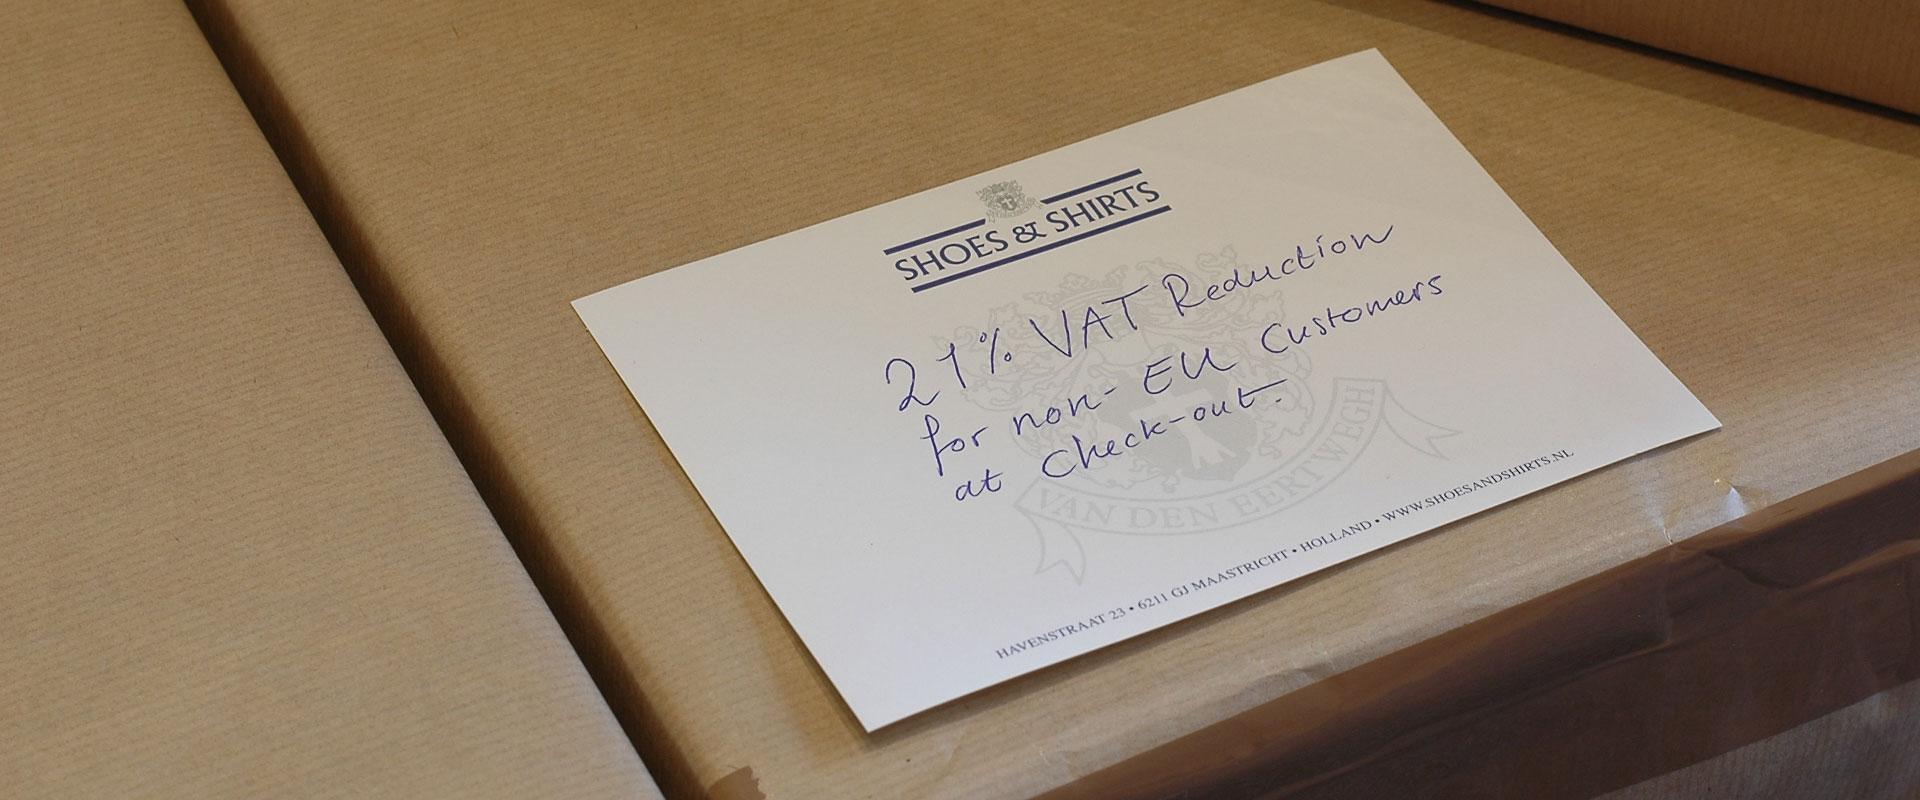 VAT shipping